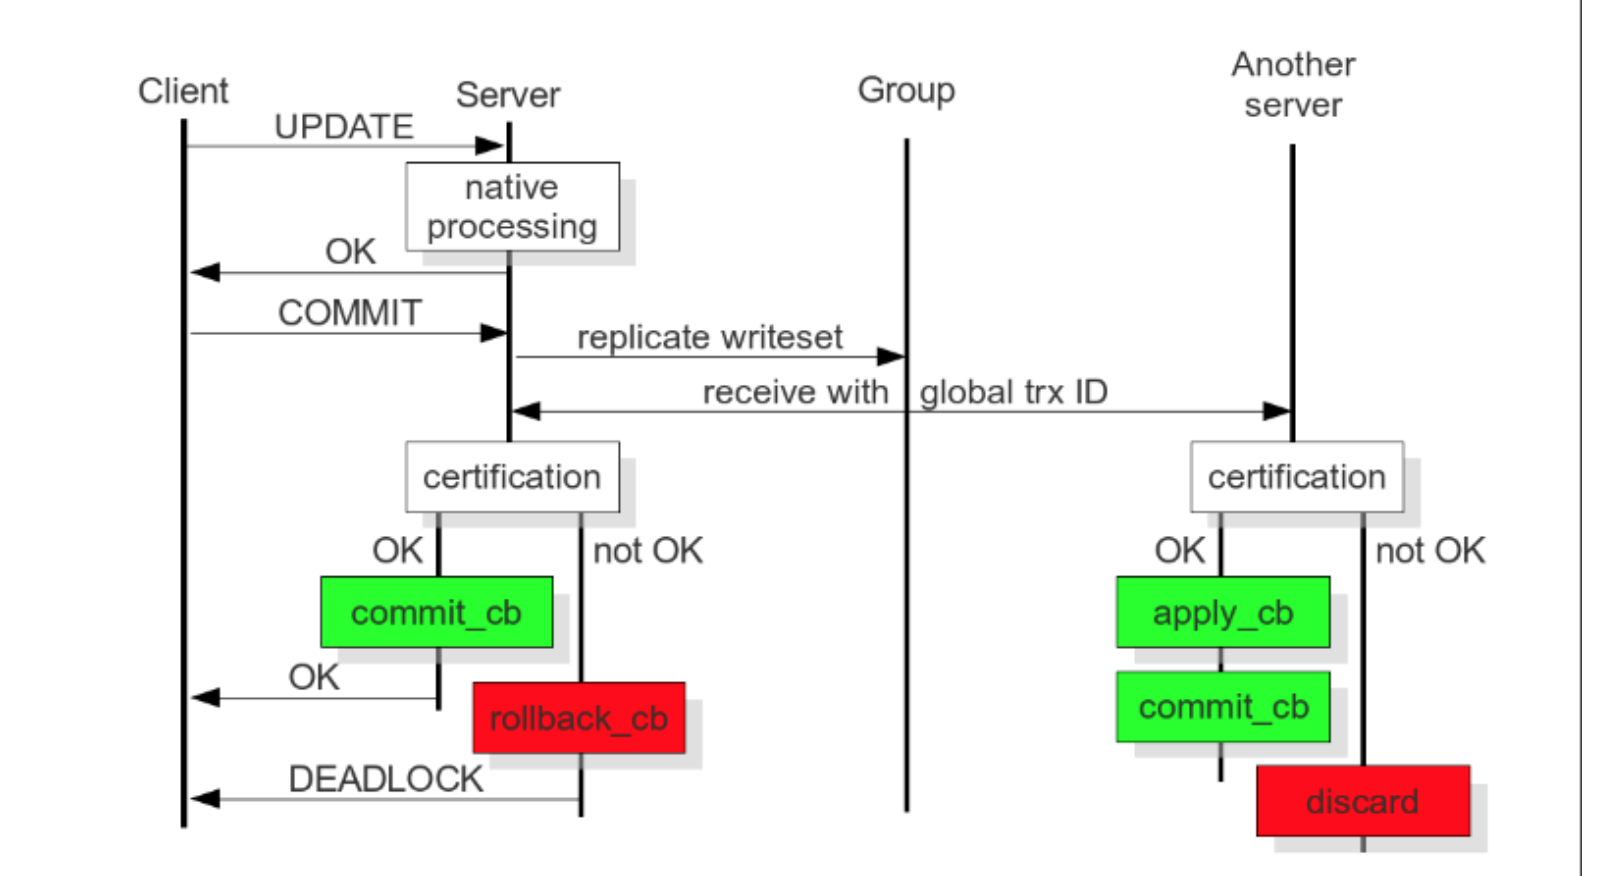 Linux之CentOS 6.7上编译+YUM两种方法配置MariaDB Galera多主集群实现HA